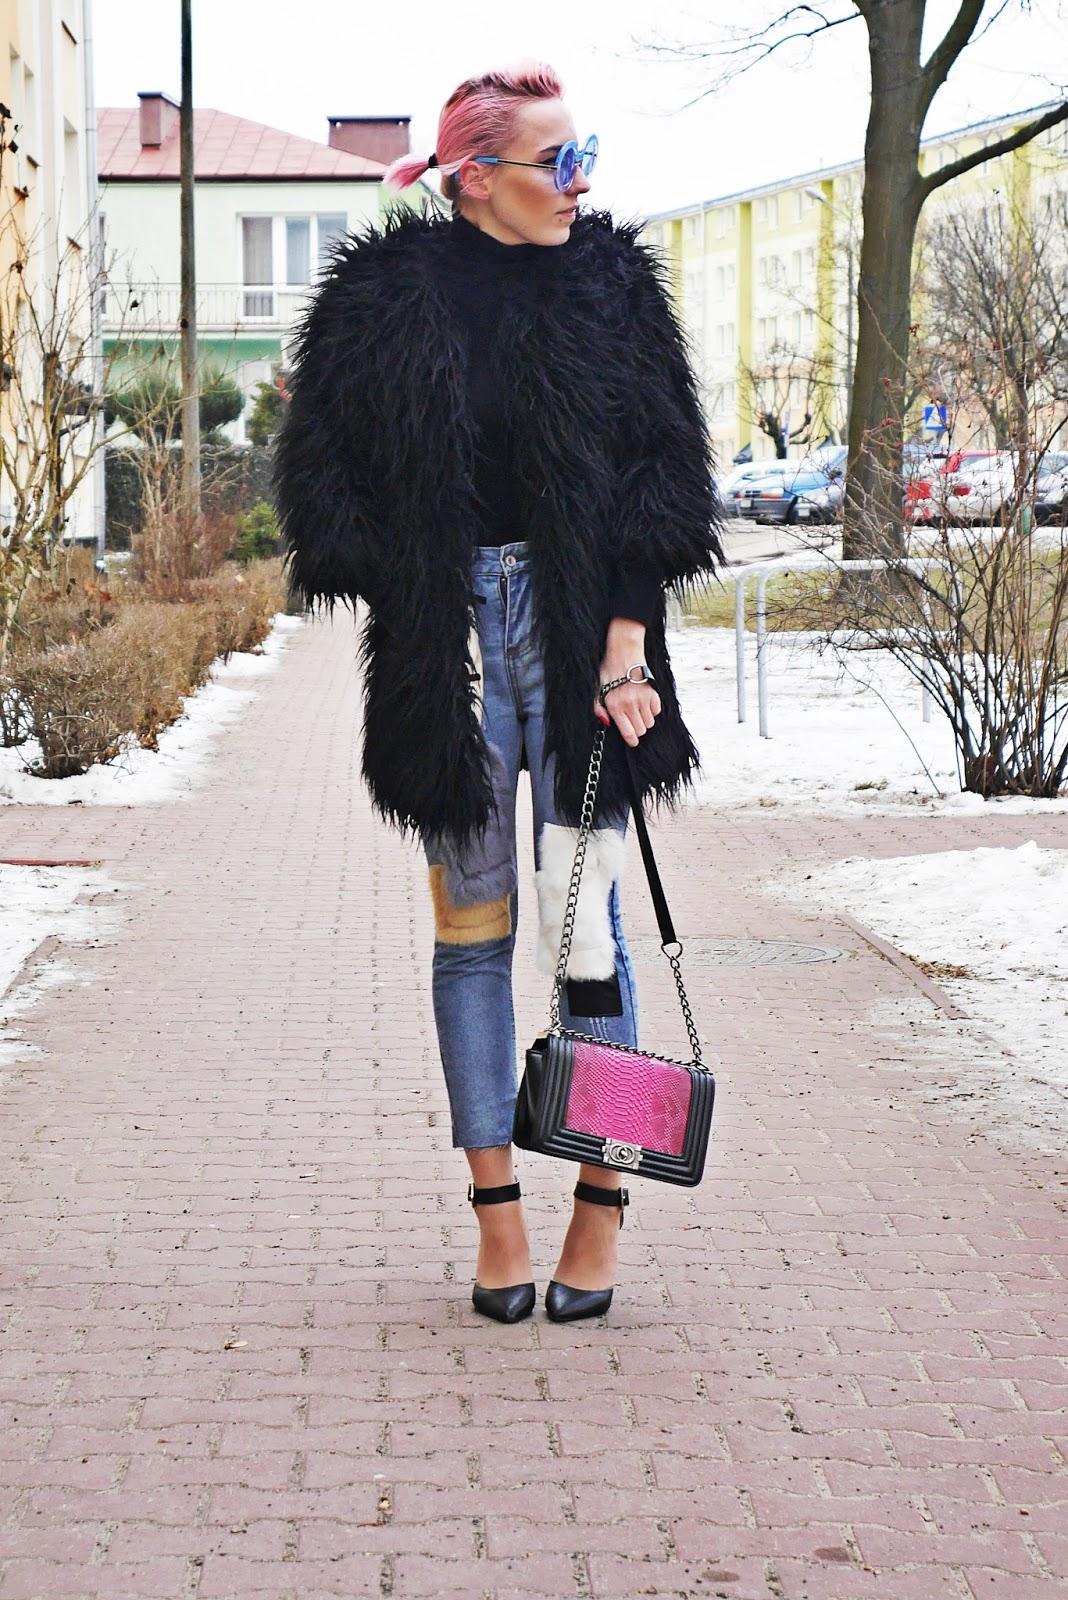 blogerka_modowa_blog_modowy_karyn_look_020217